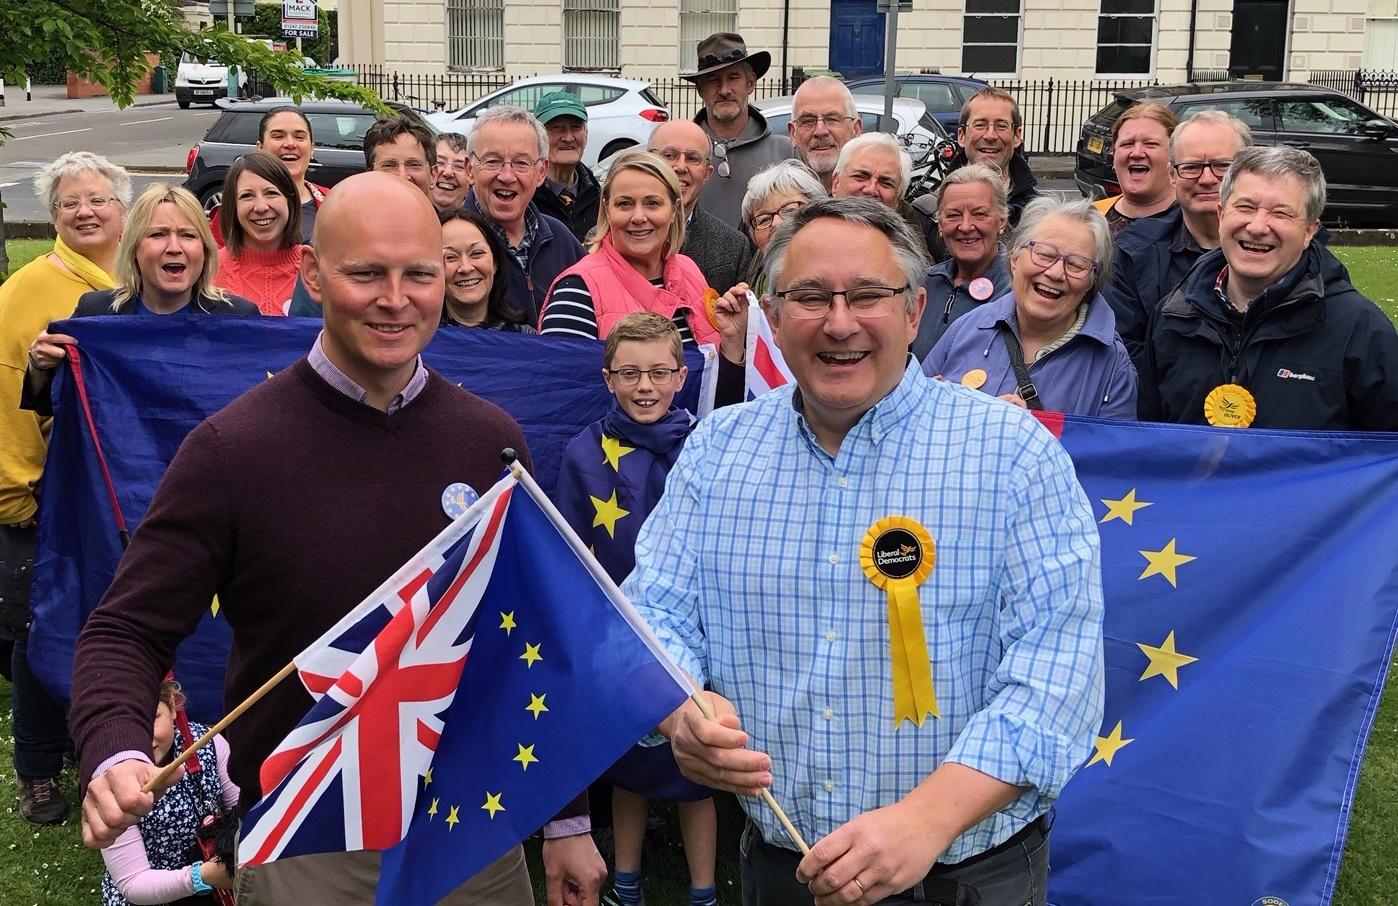 Max standing up for hundreds of EU nationals in Cheltenham left in legal limbo